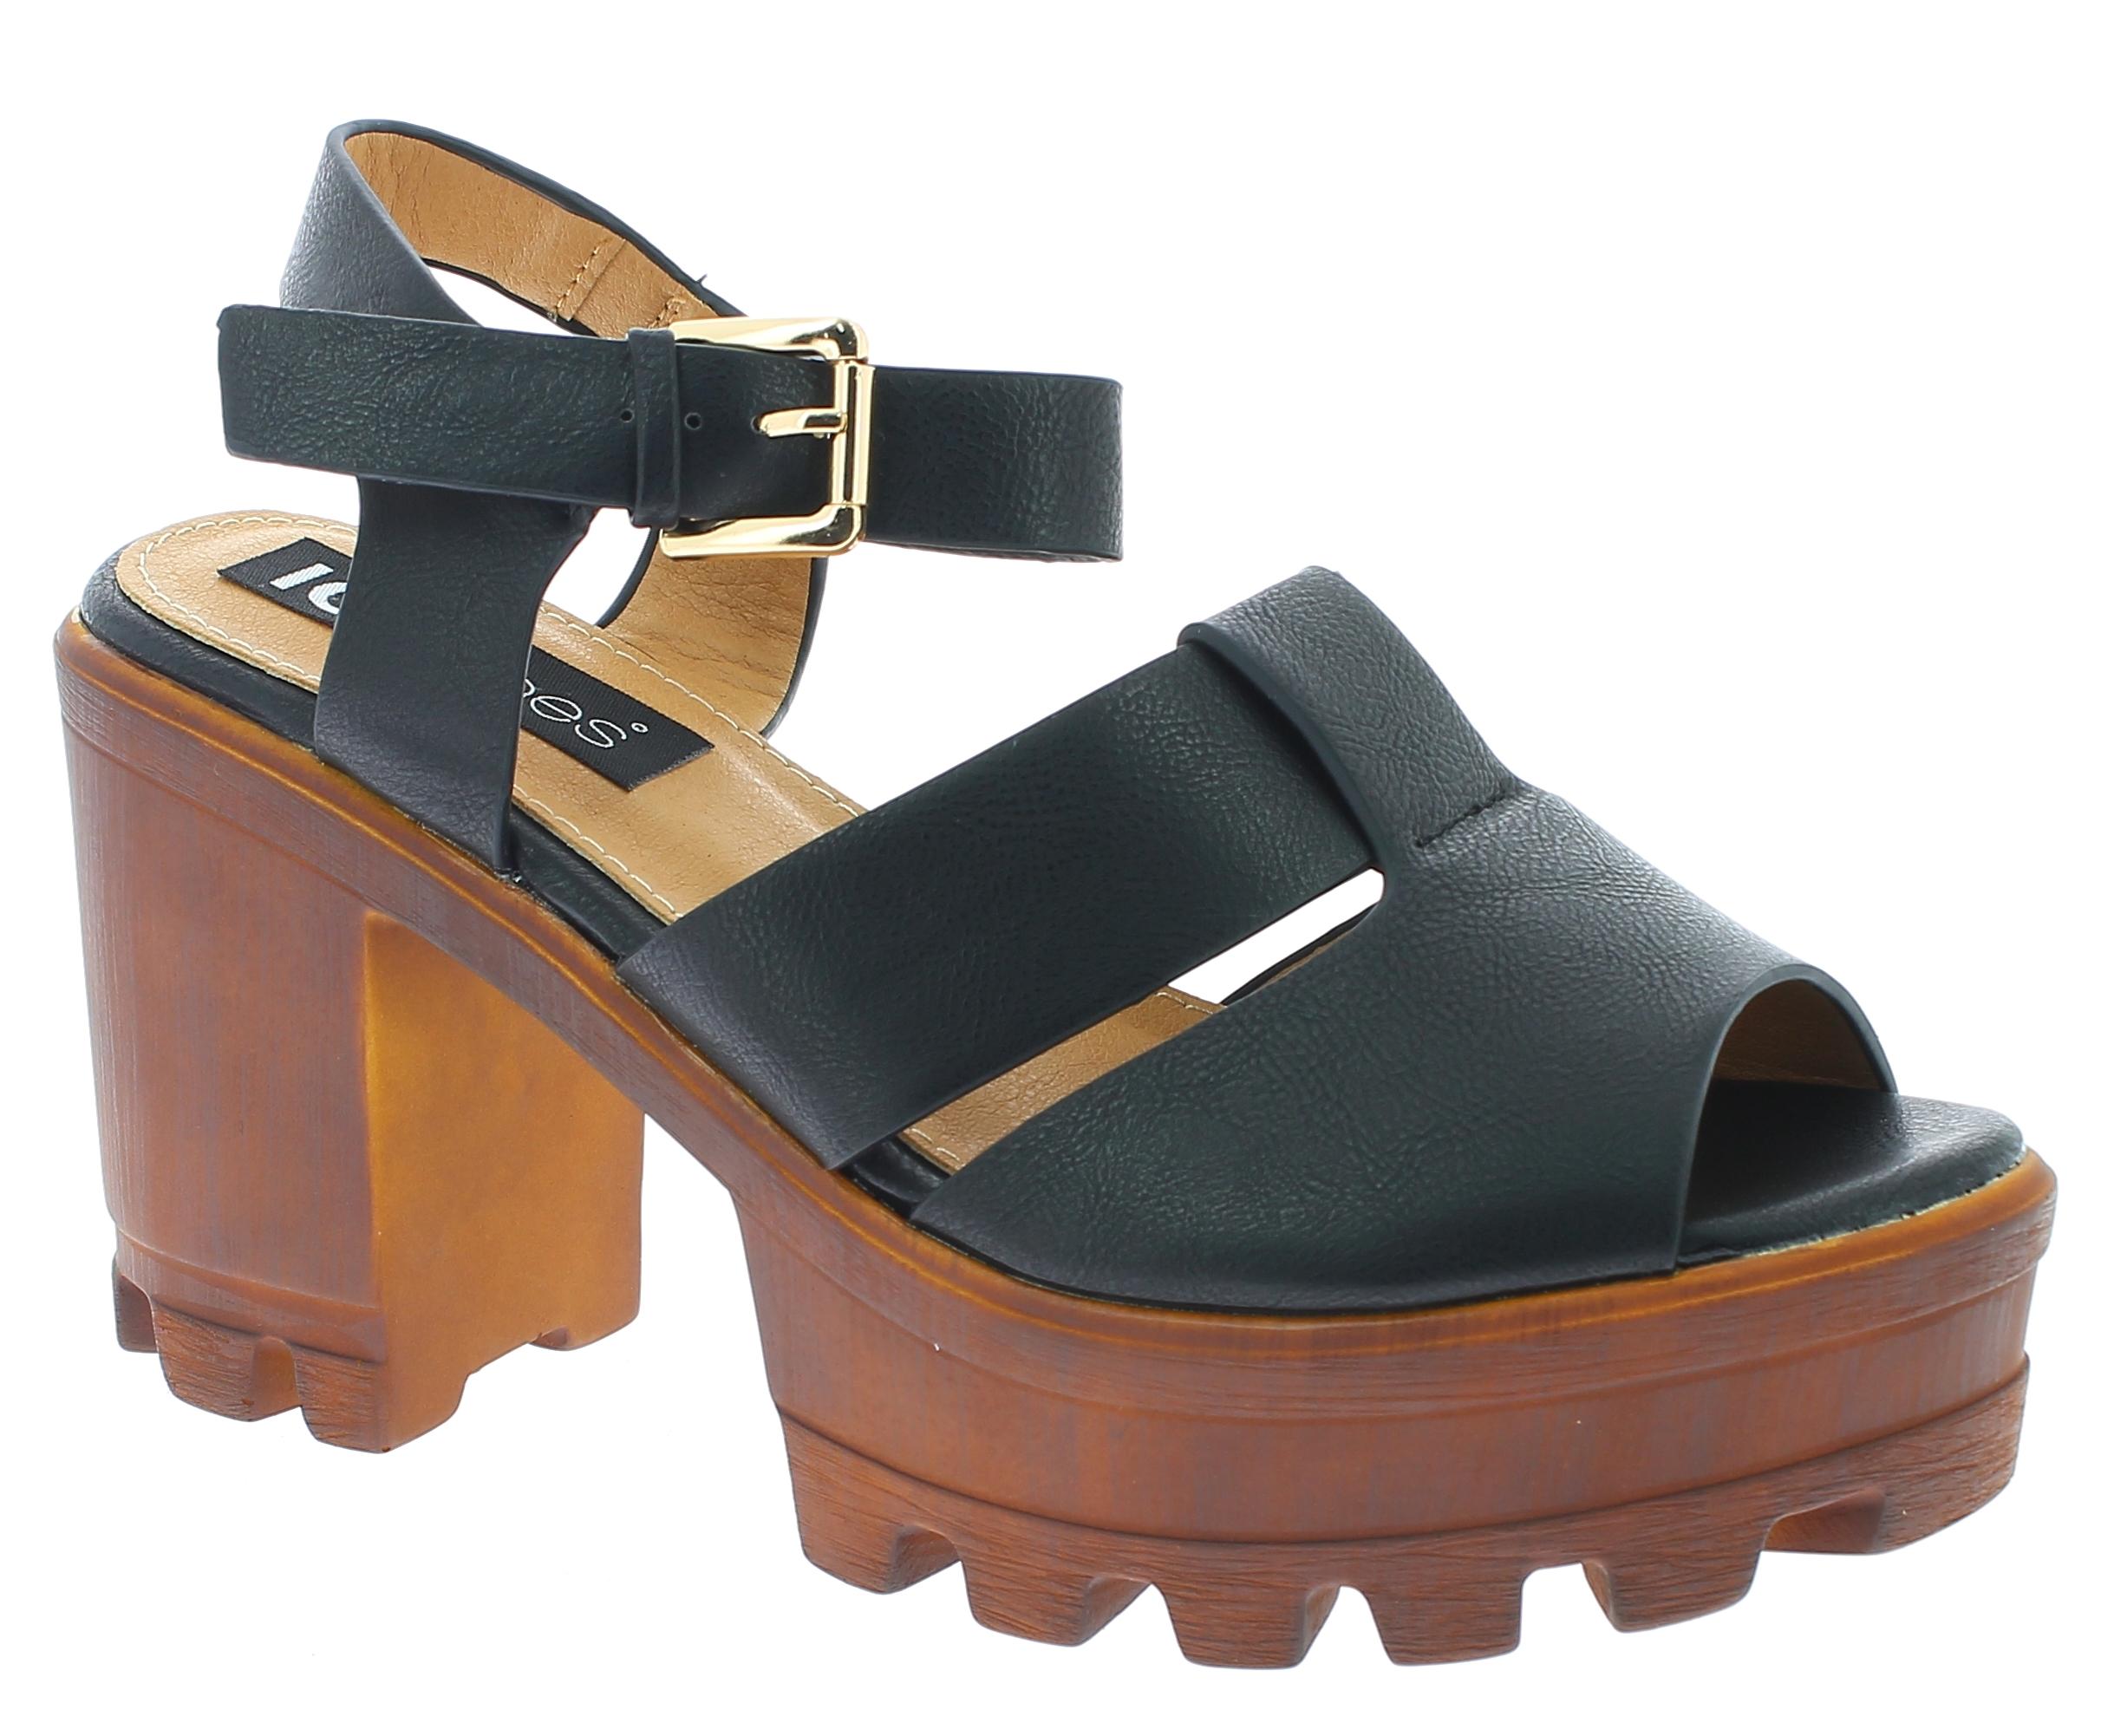 IQSHOES Γυναικείο Πέδιλο 3A3423 Μαύρο - IqShoes - 3A3423 BLACK-black-36/1/15/7 παπούτσια  πέδιλα